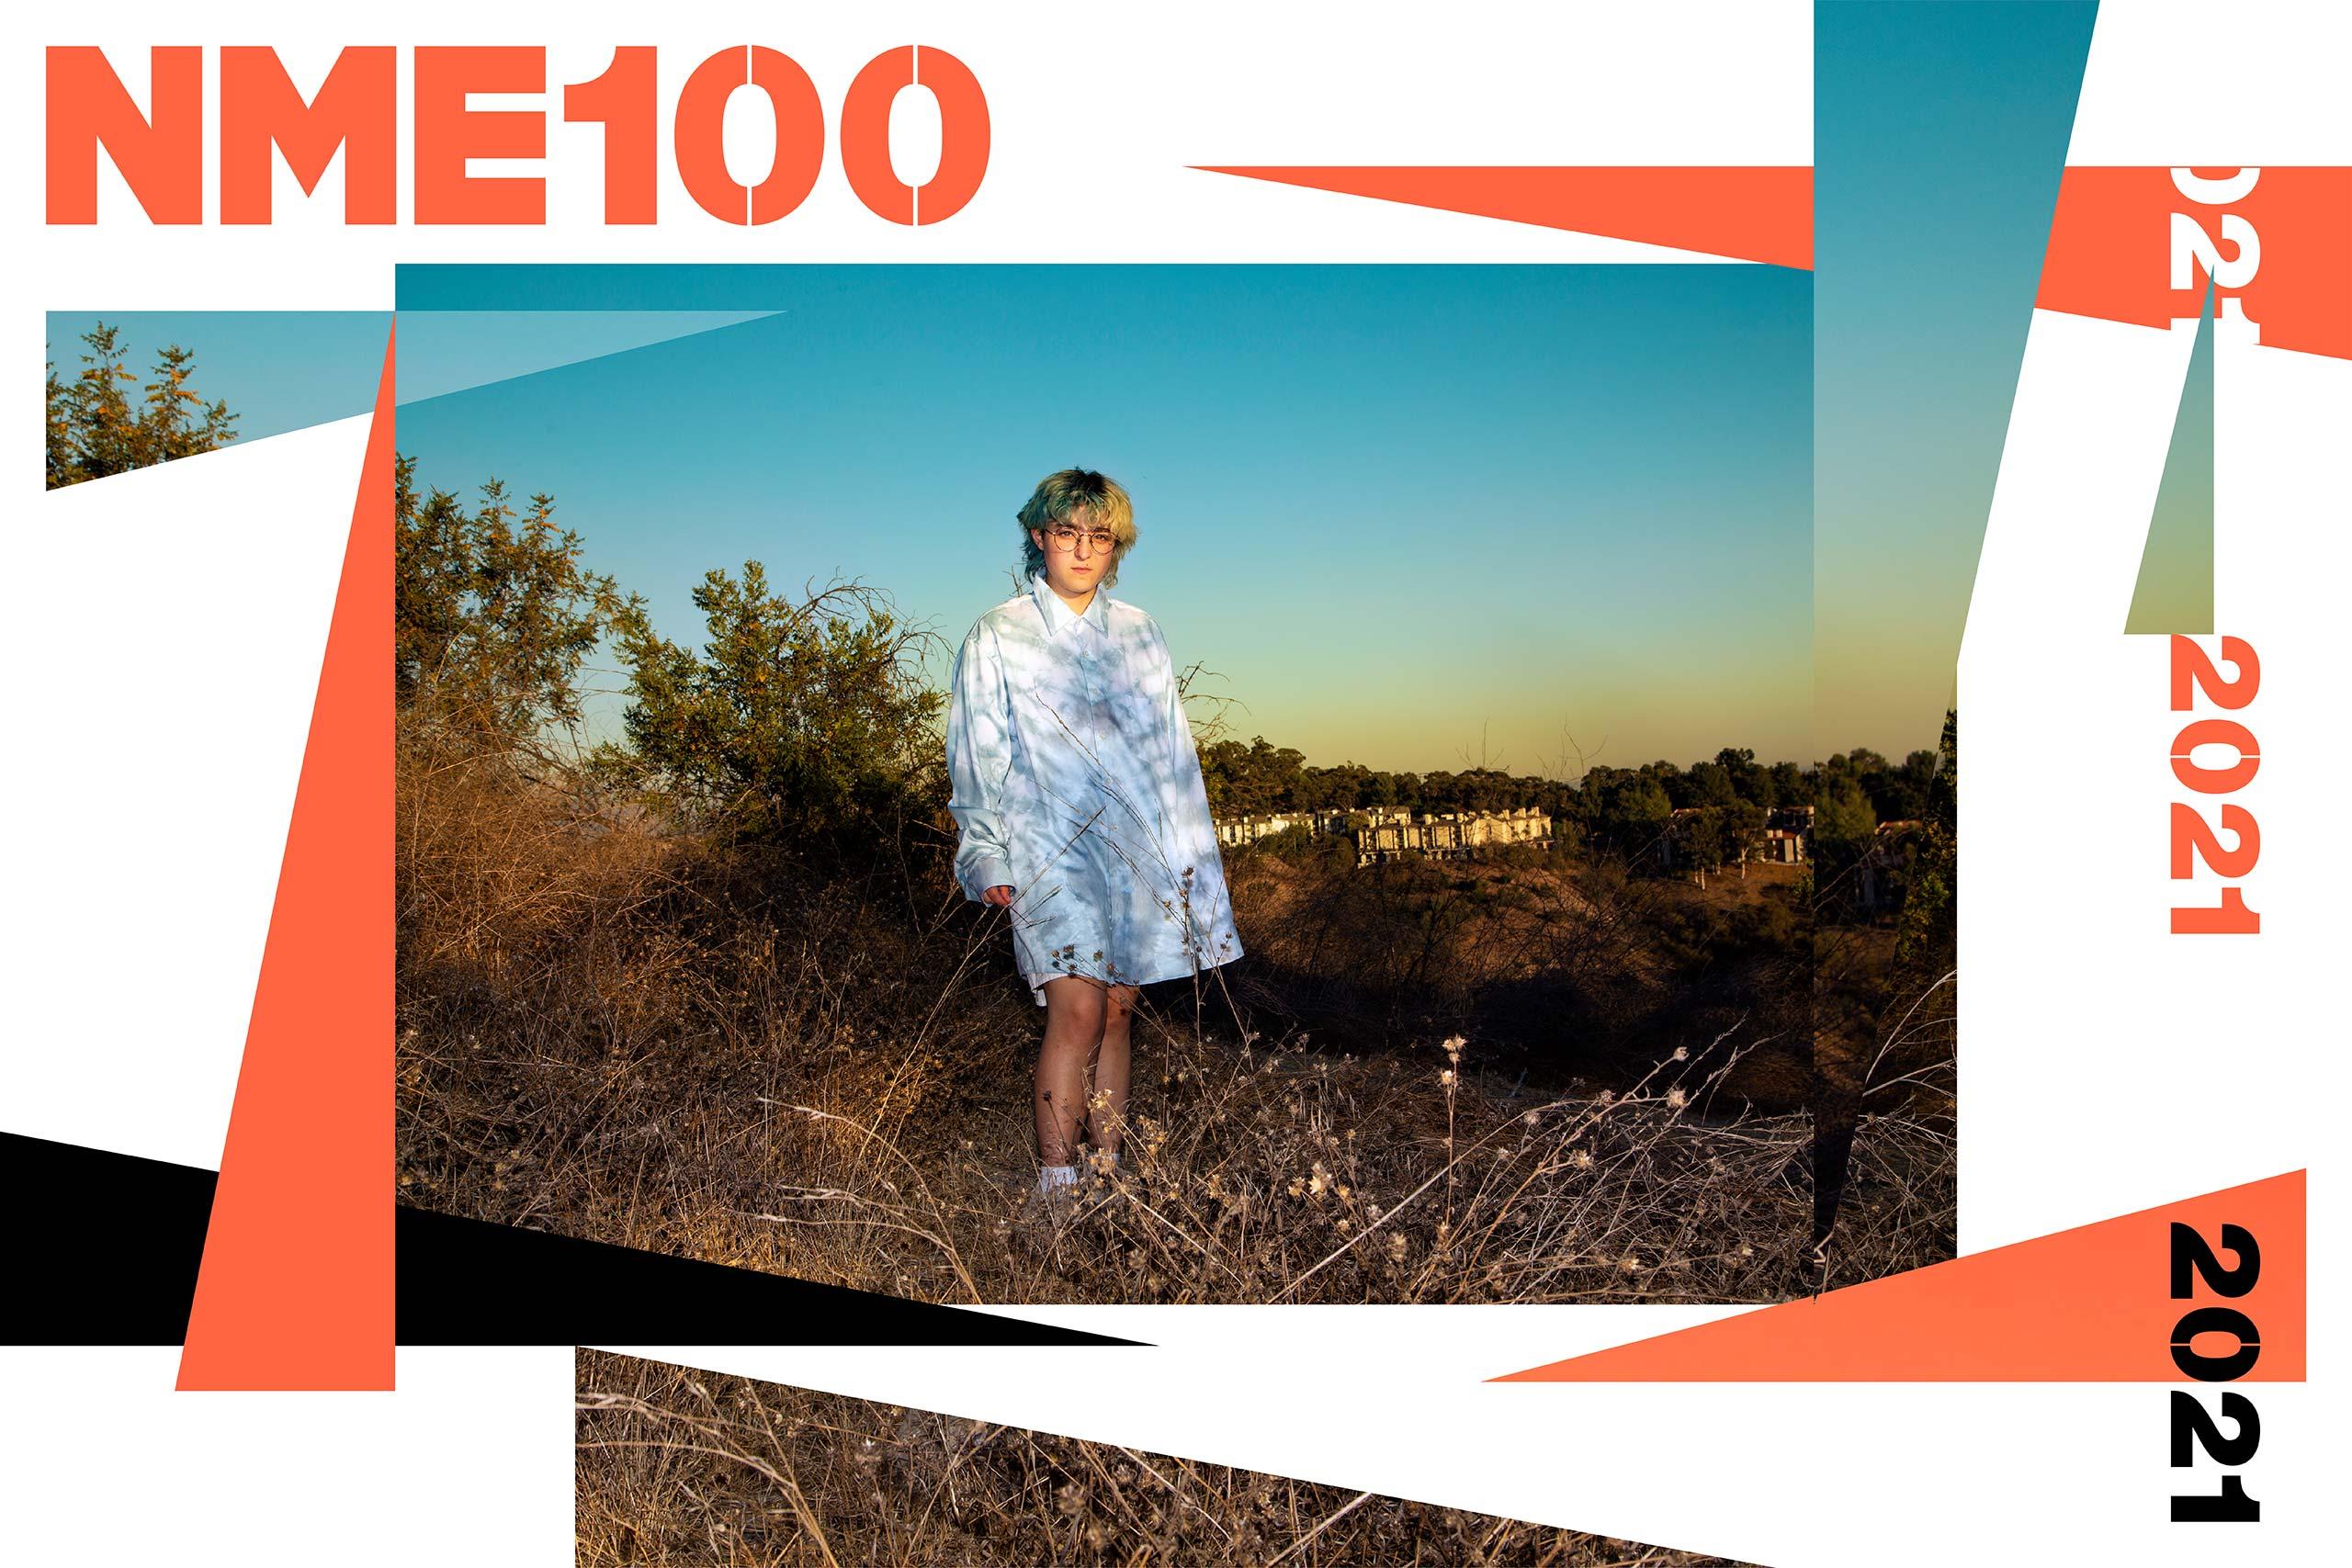 NME 100 claud